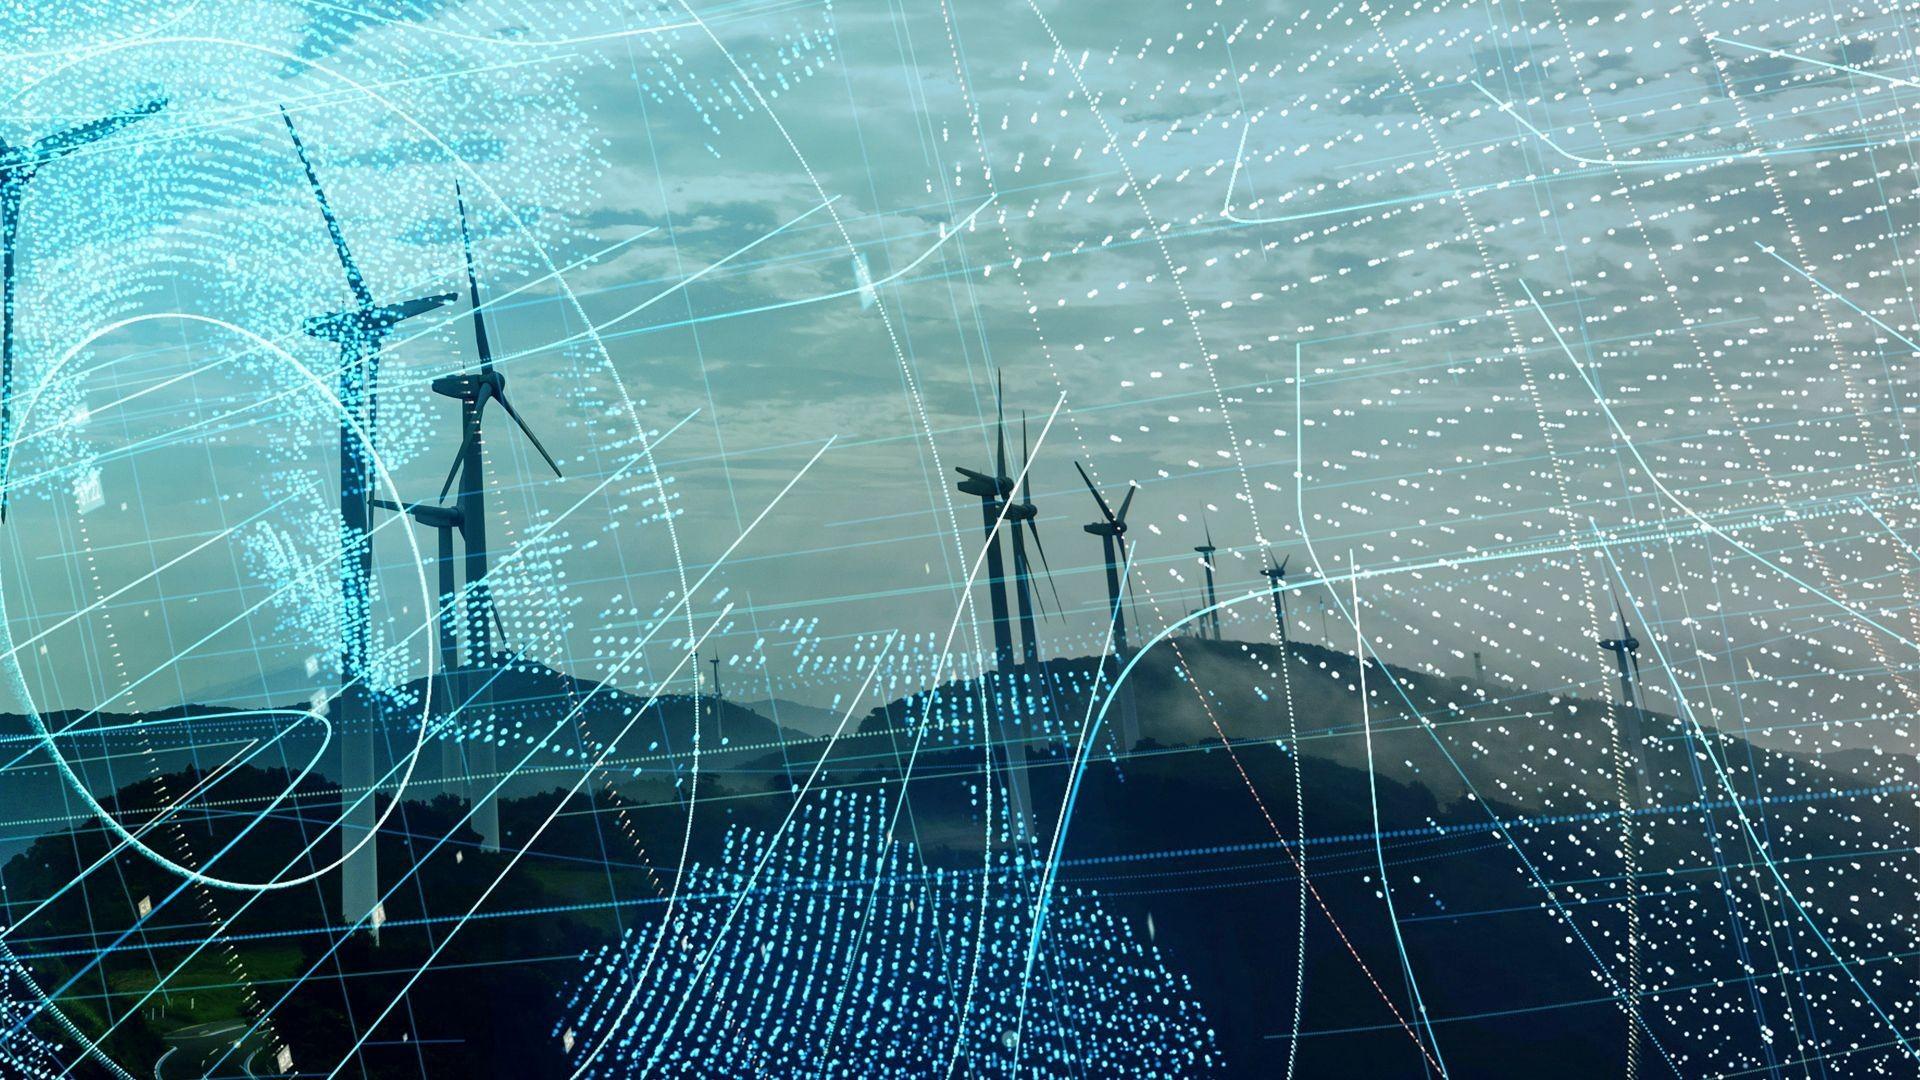 Todo tipo de energías renovables en Galicia